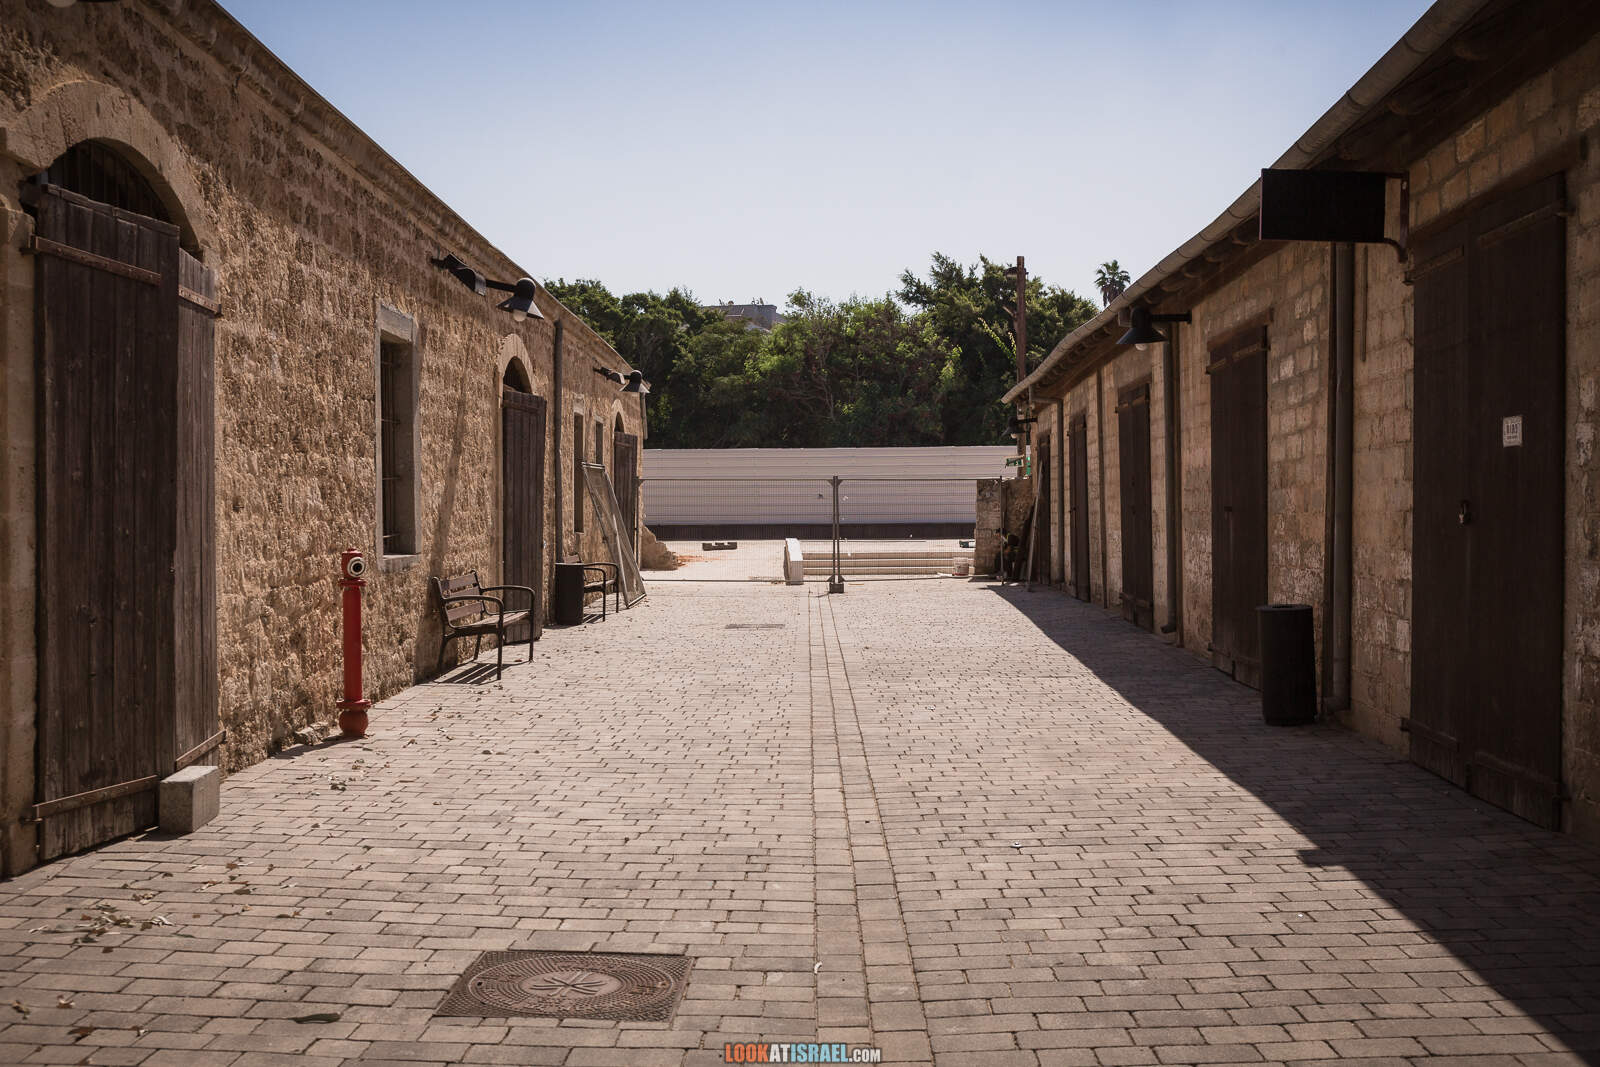 Тель-Авив, железнодорожная станция Ха-Тахана во время карантина | Lockdown on beaches of Tel Aviv | LookAtIsrael.com - Фото путешествия по Израилю